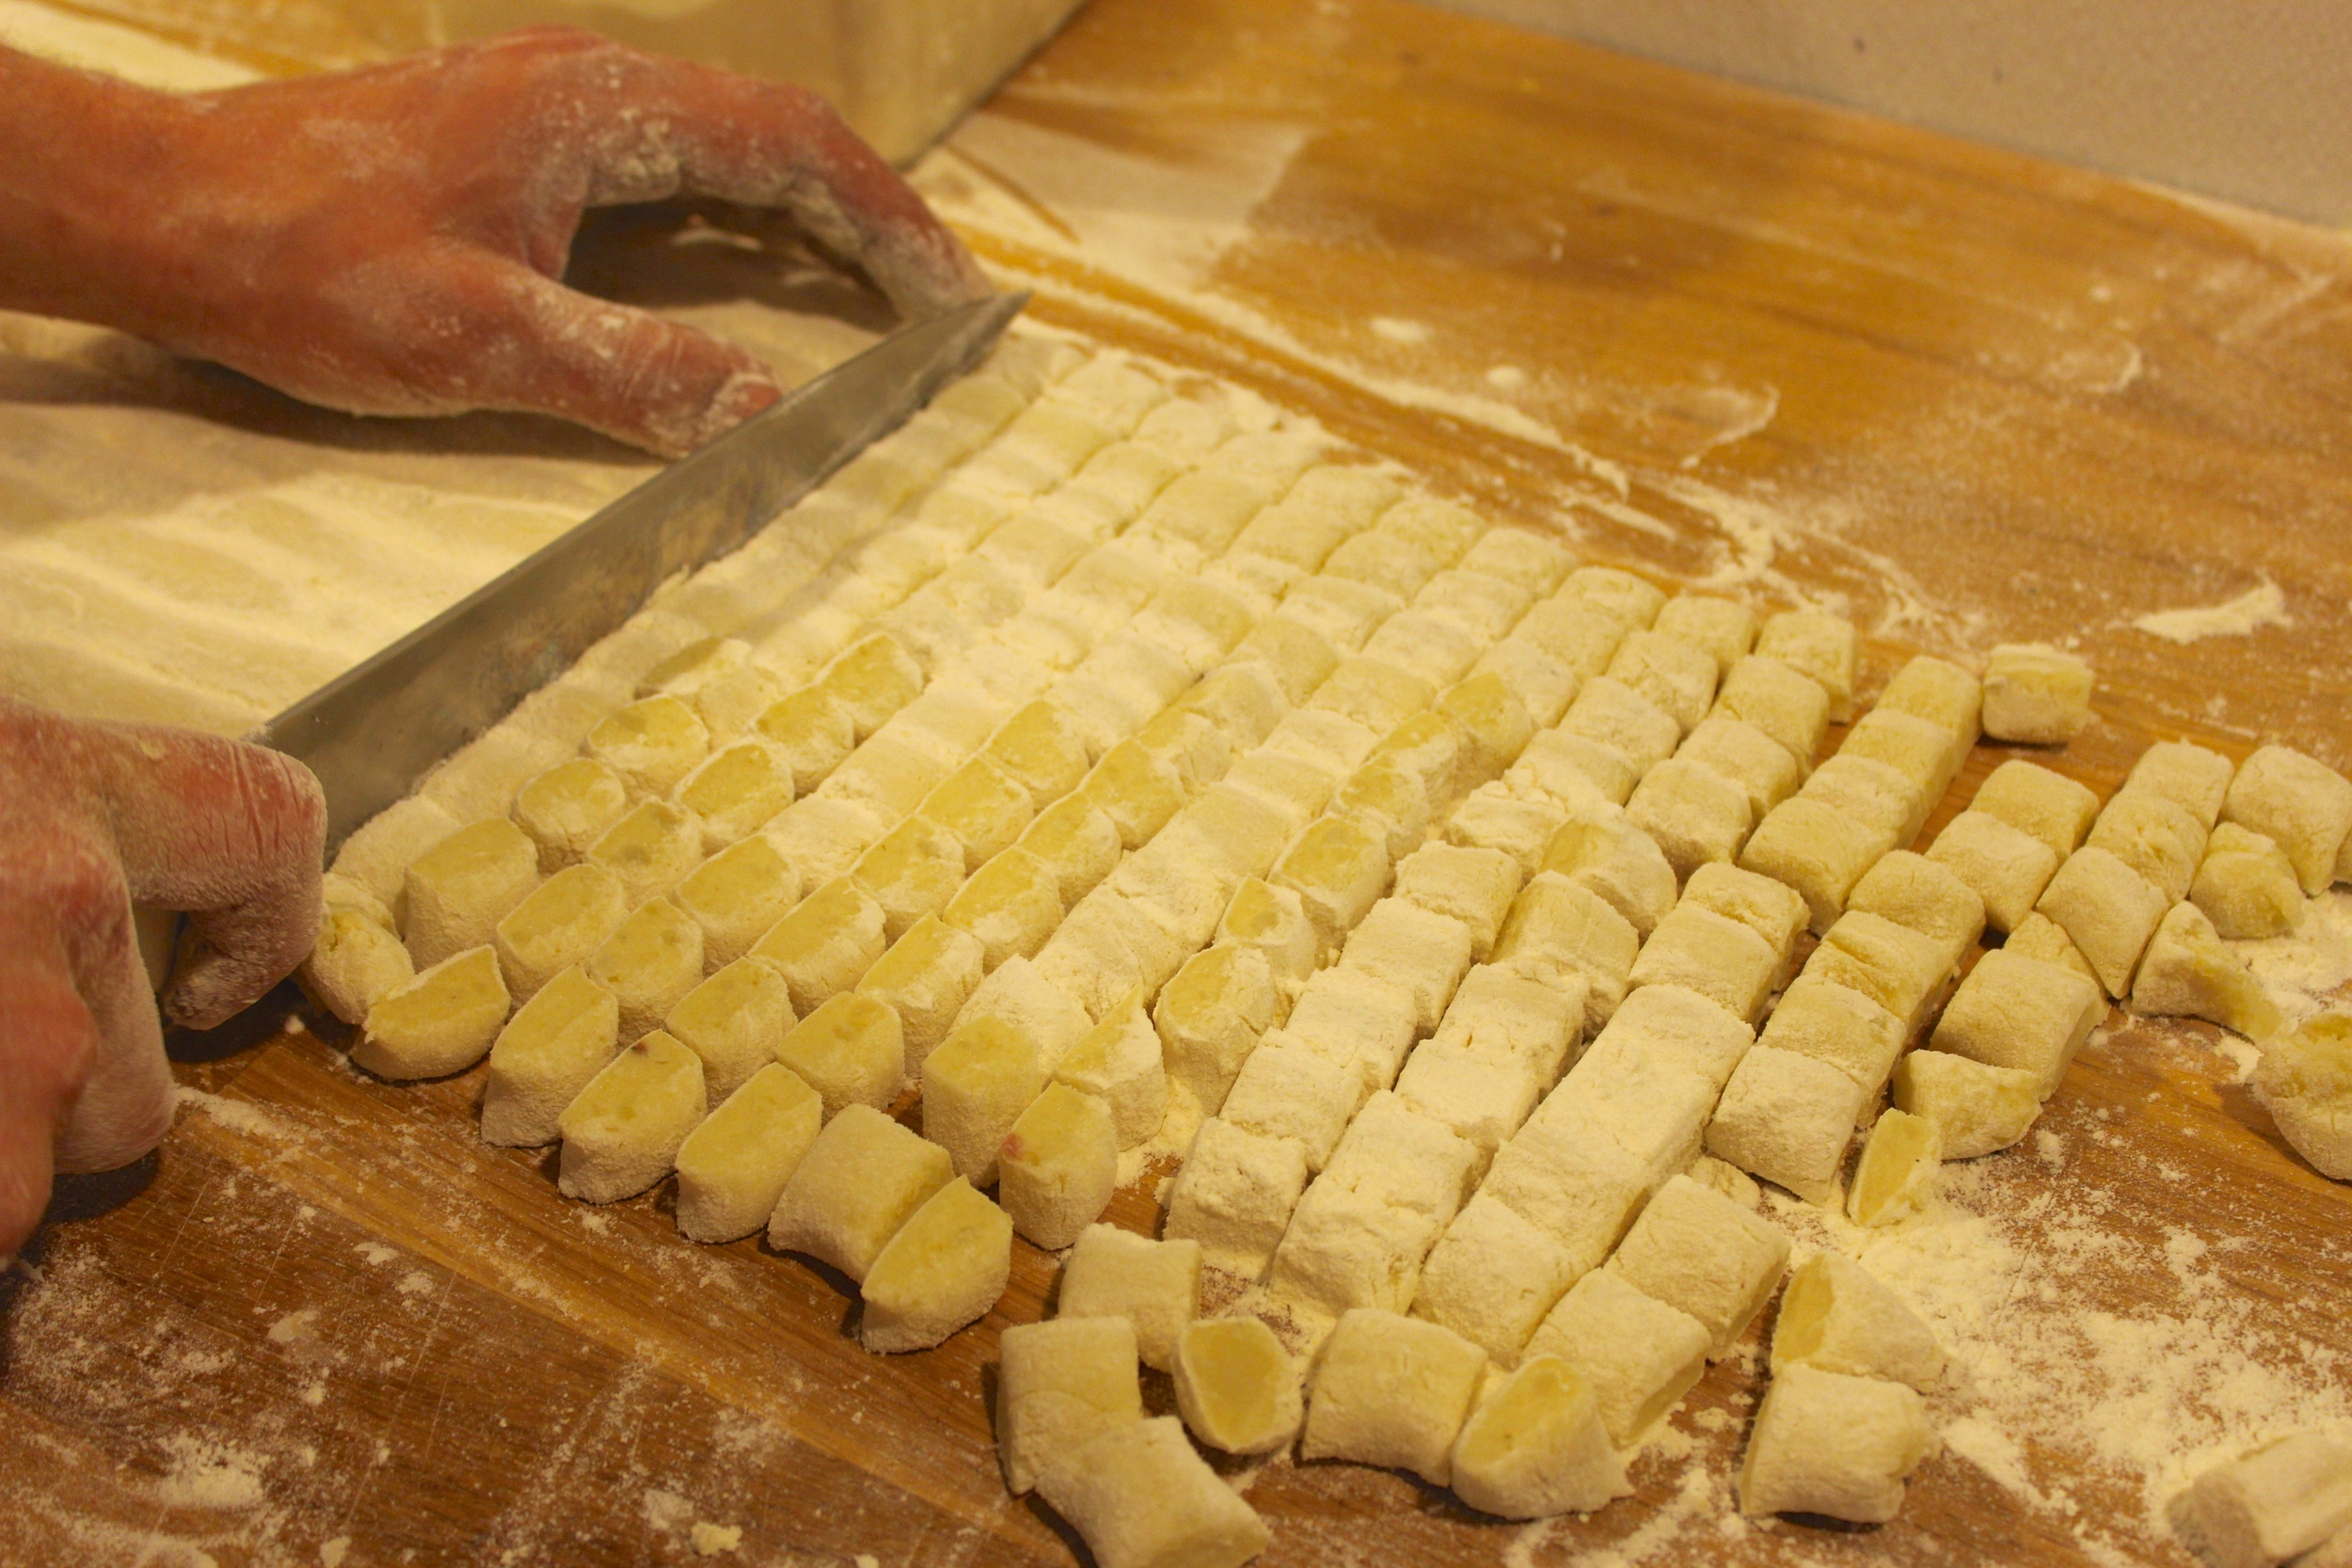 cutting gnocchi with a knife